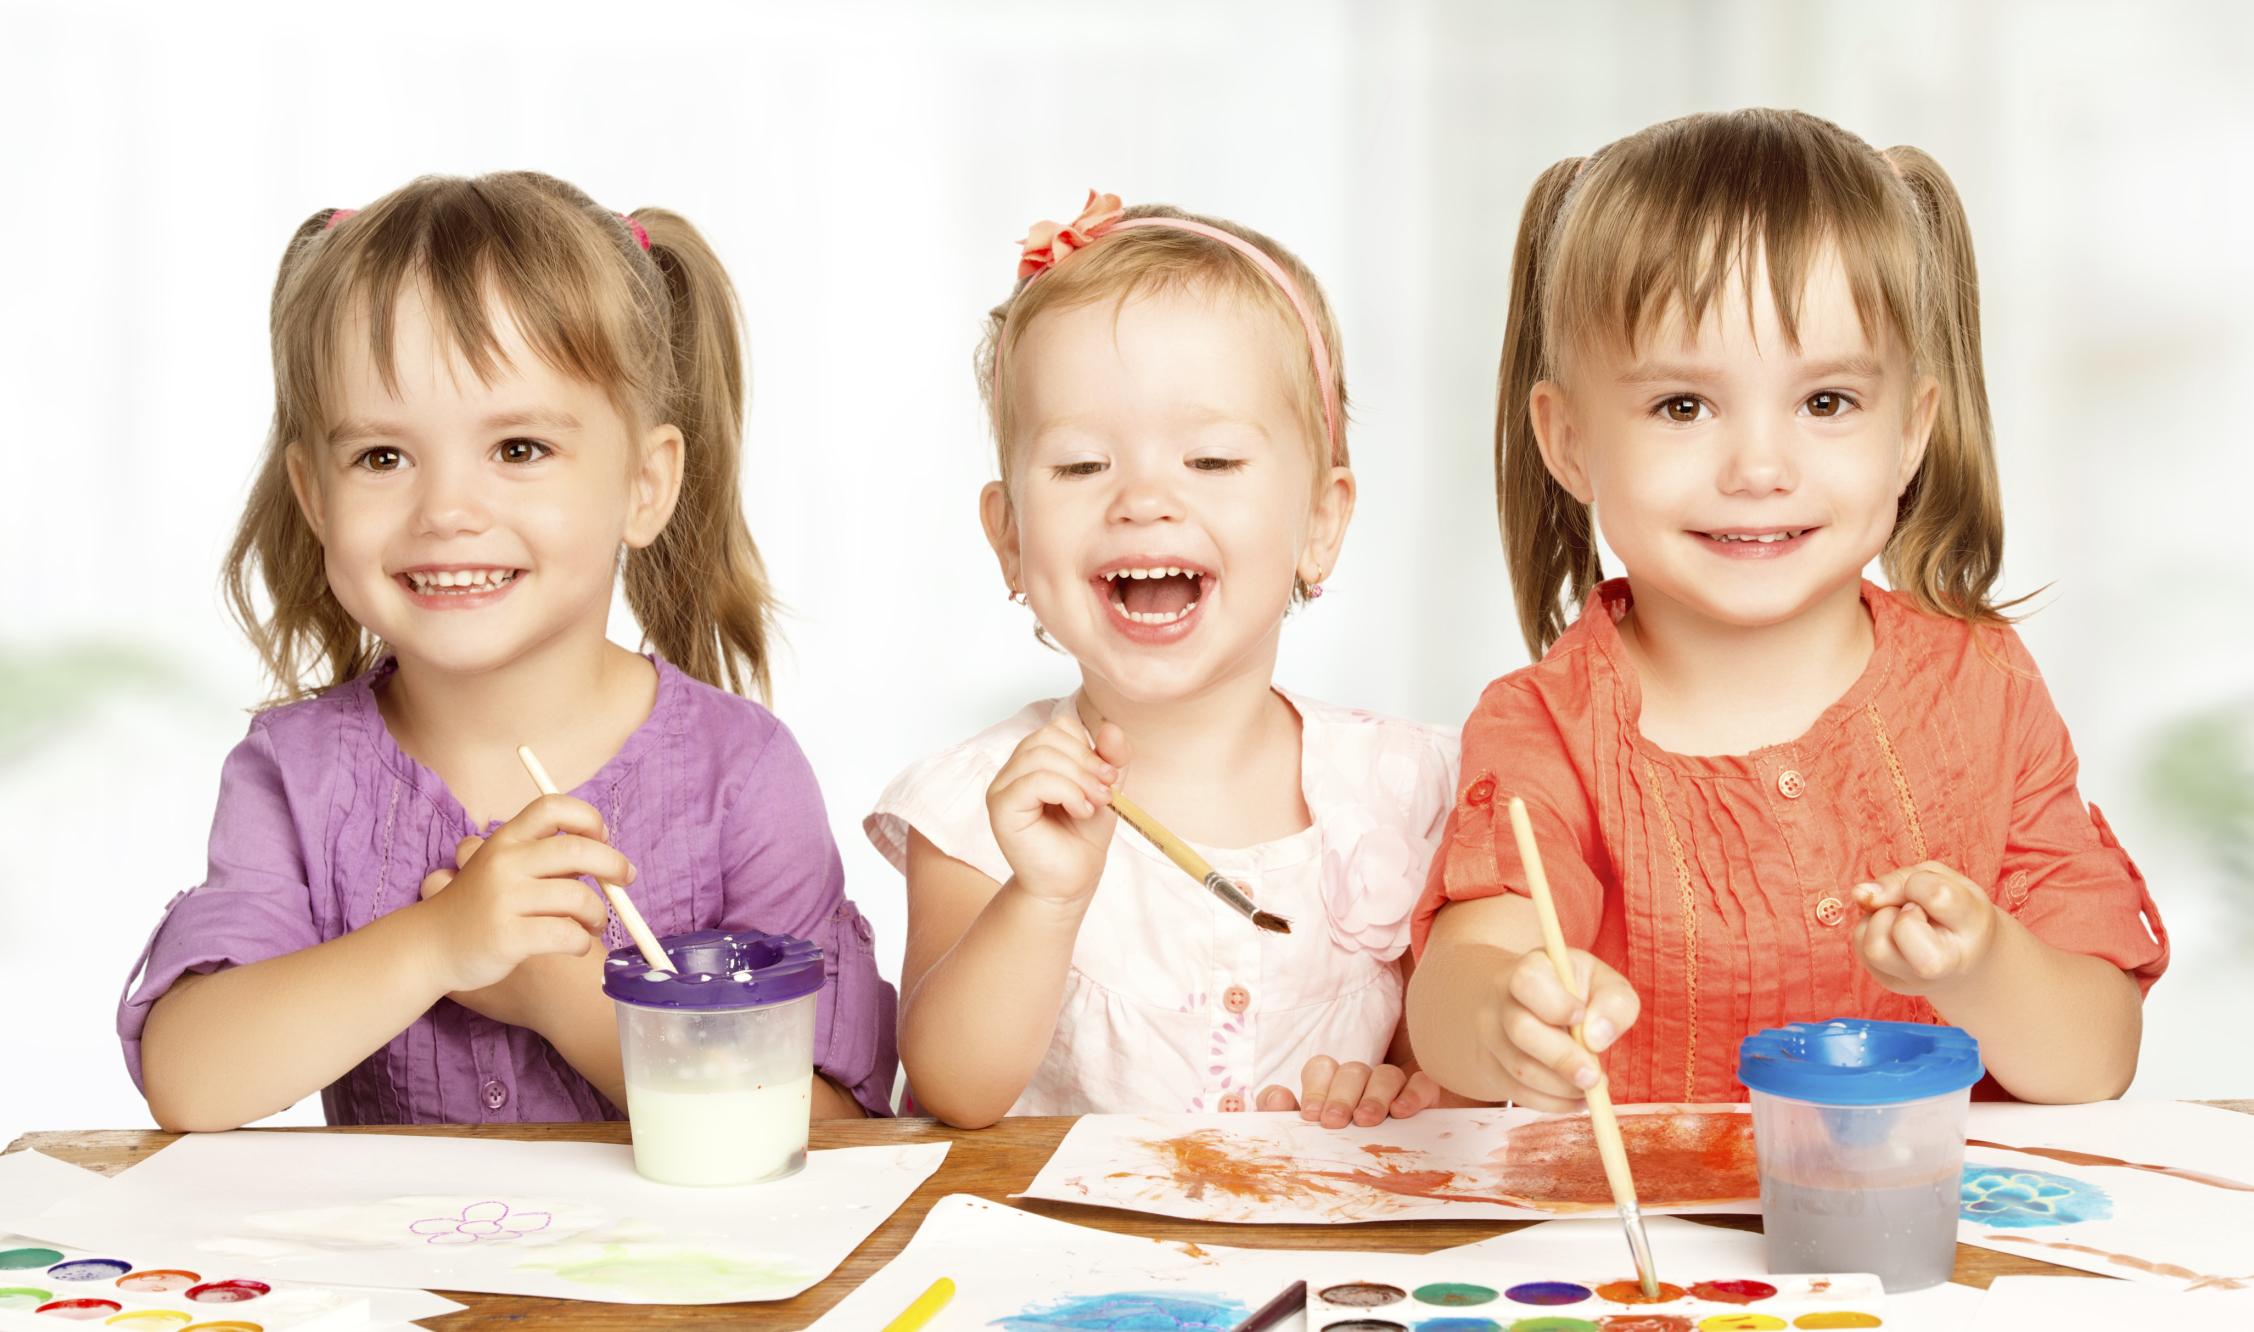 Testemunho-Auxiliar-Educação Infantil-Babysitting